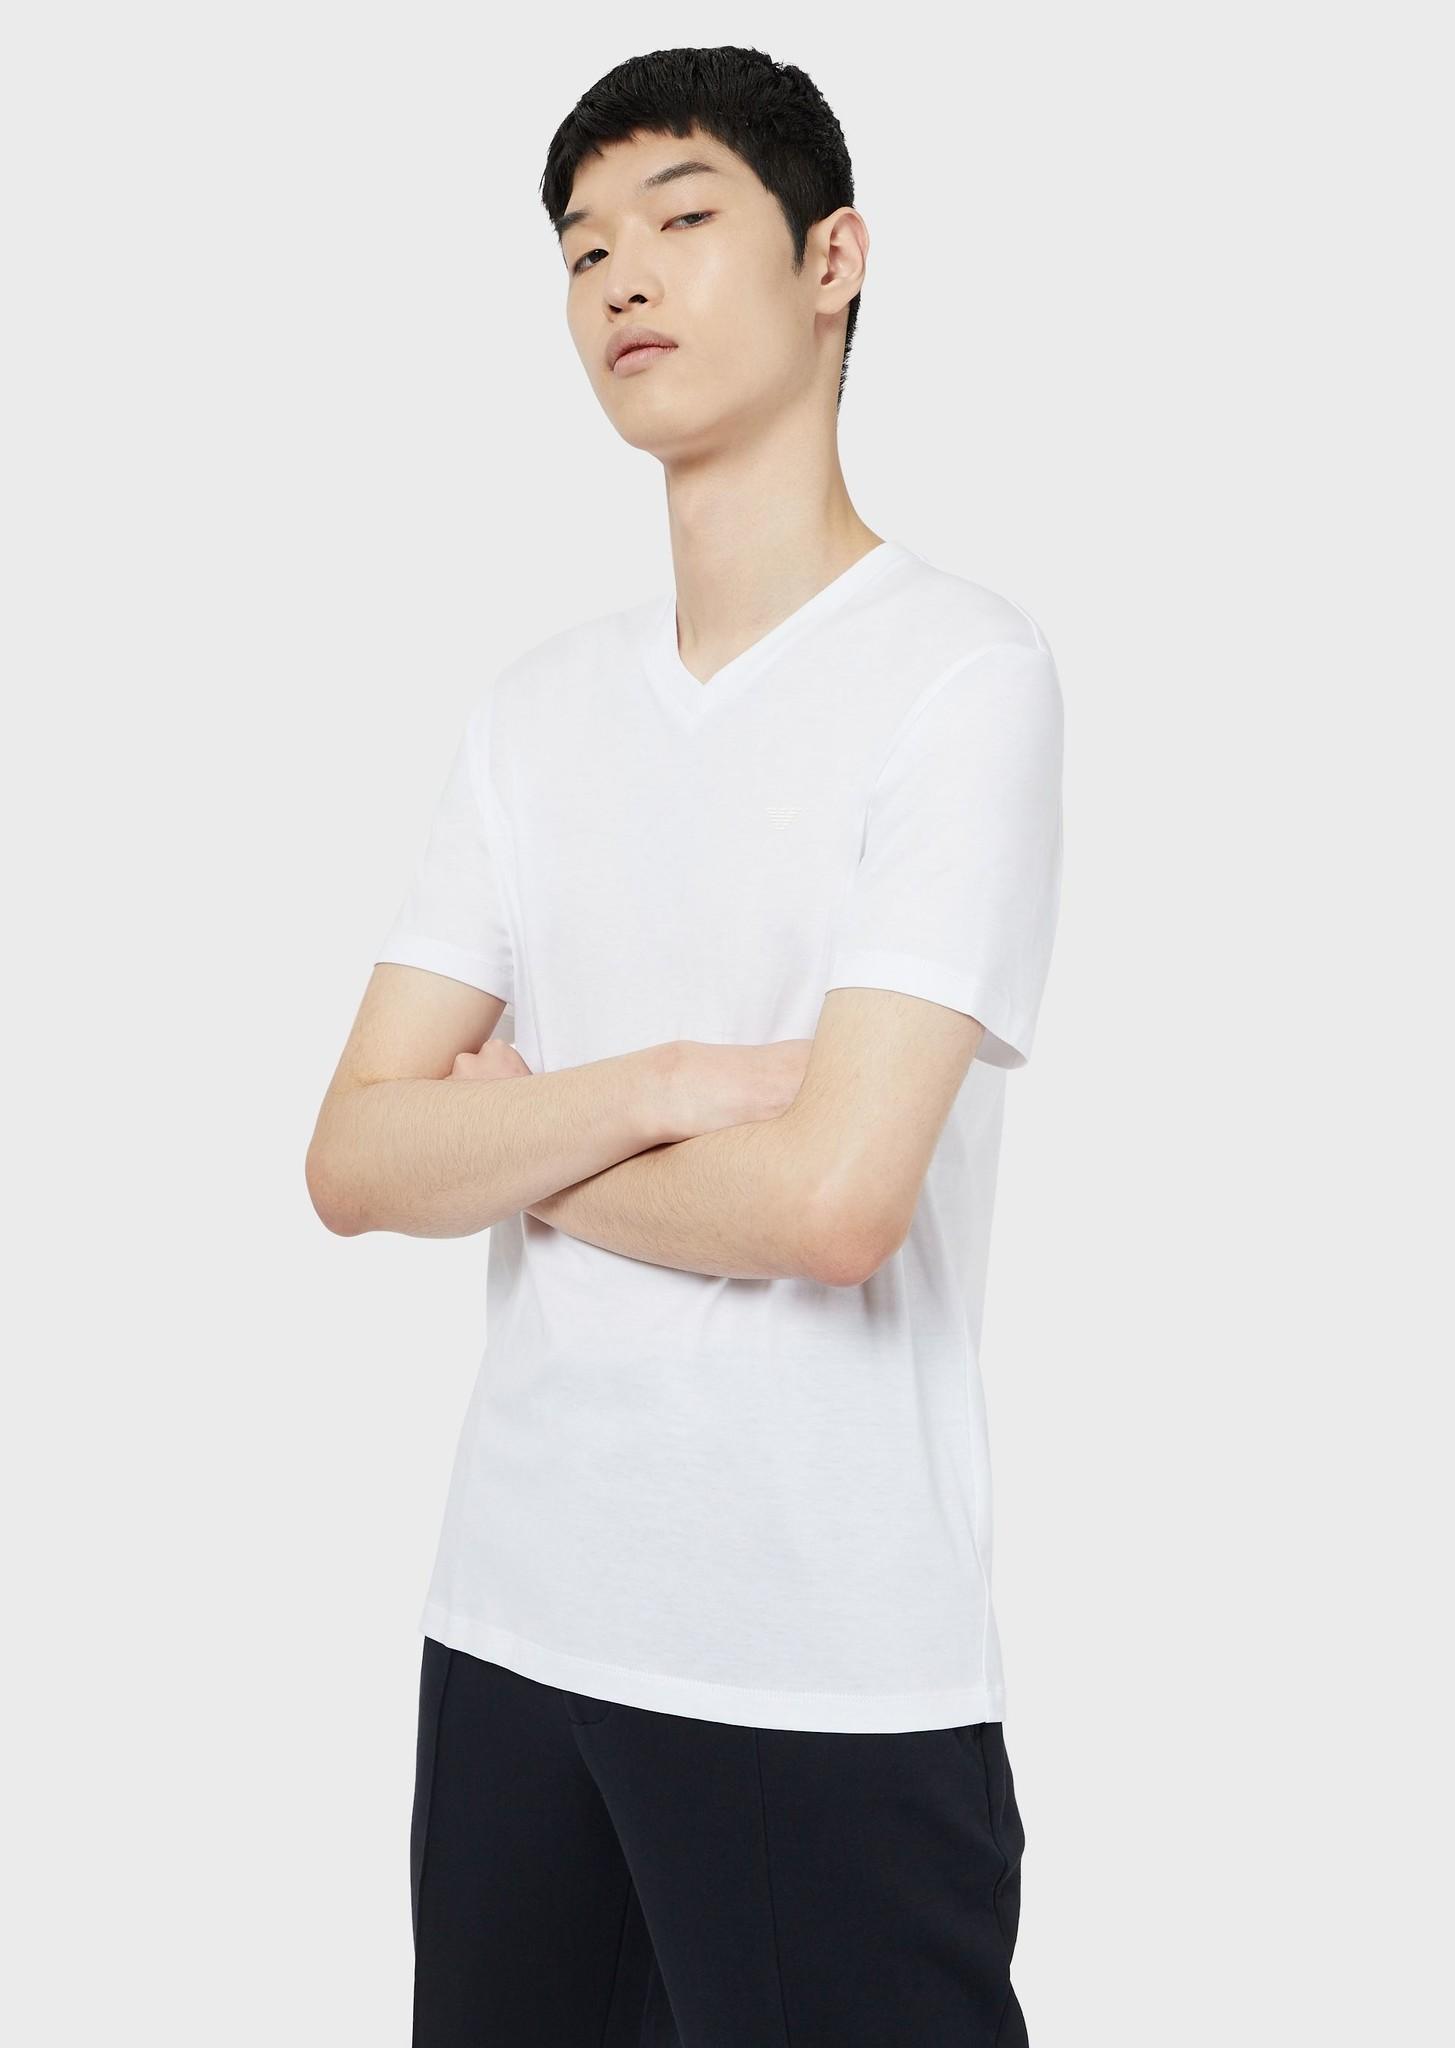 Emporio Armani T-shirt Emporio Armani 3K1TAS-1JSHZ-0100